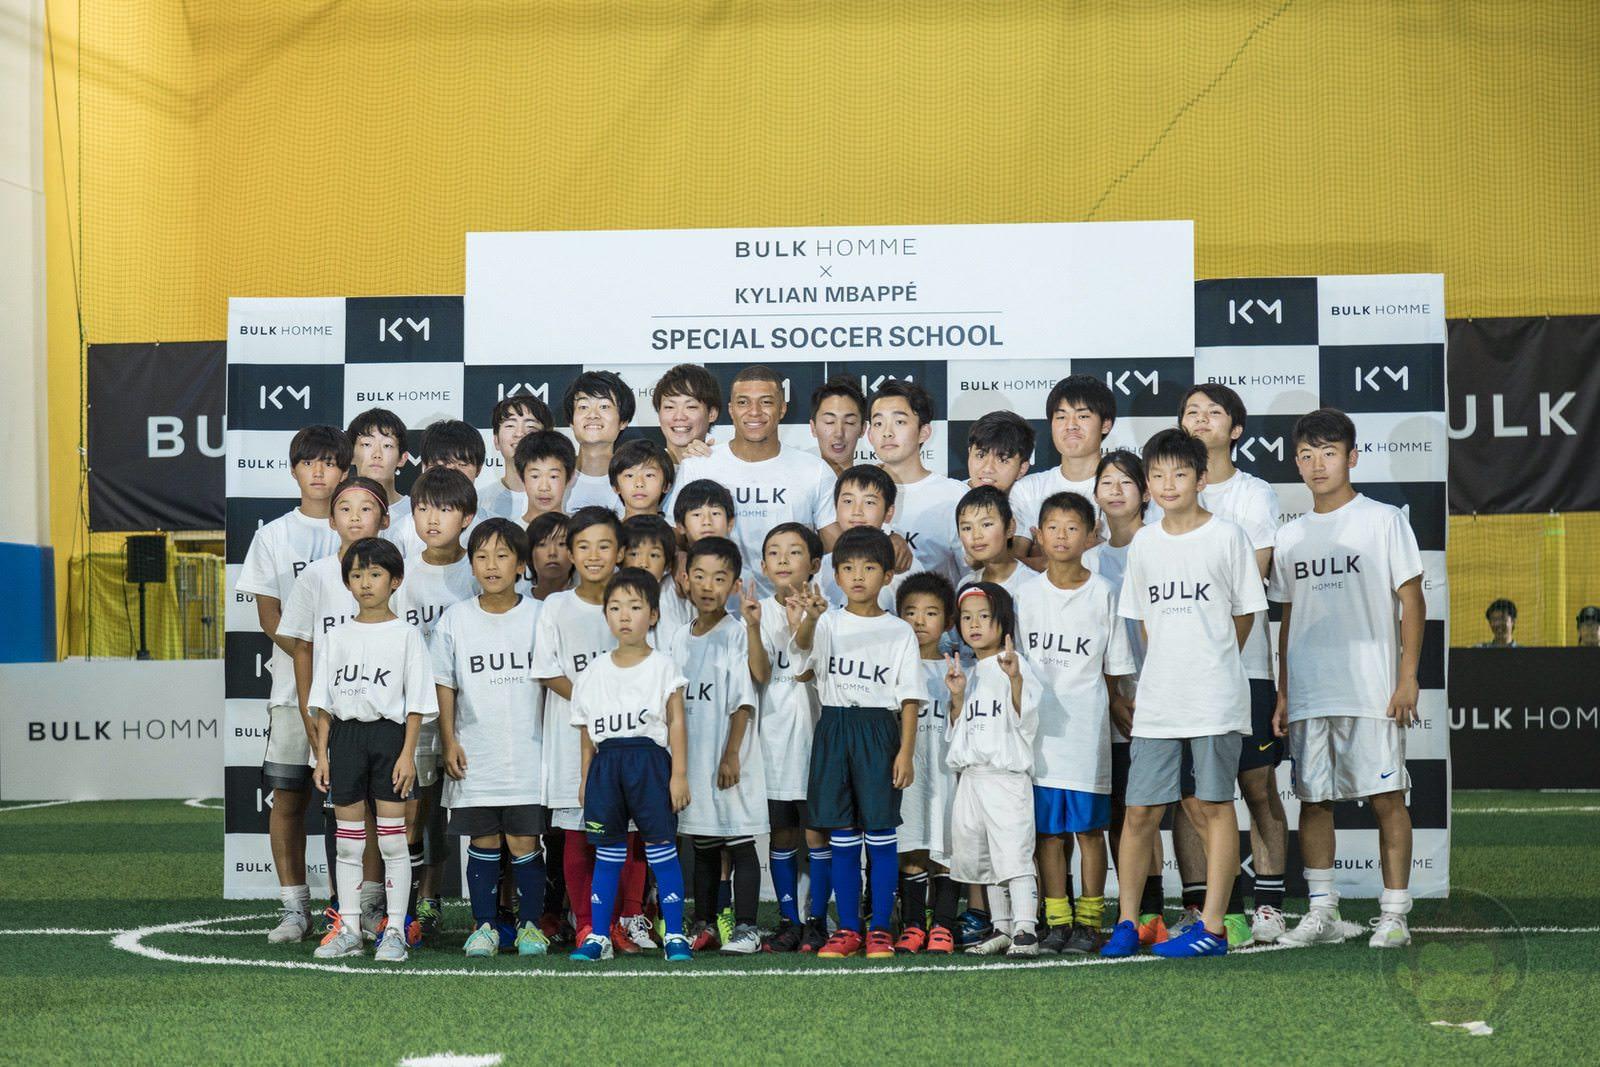 Kylian Mbappé plays soccer with kids 25